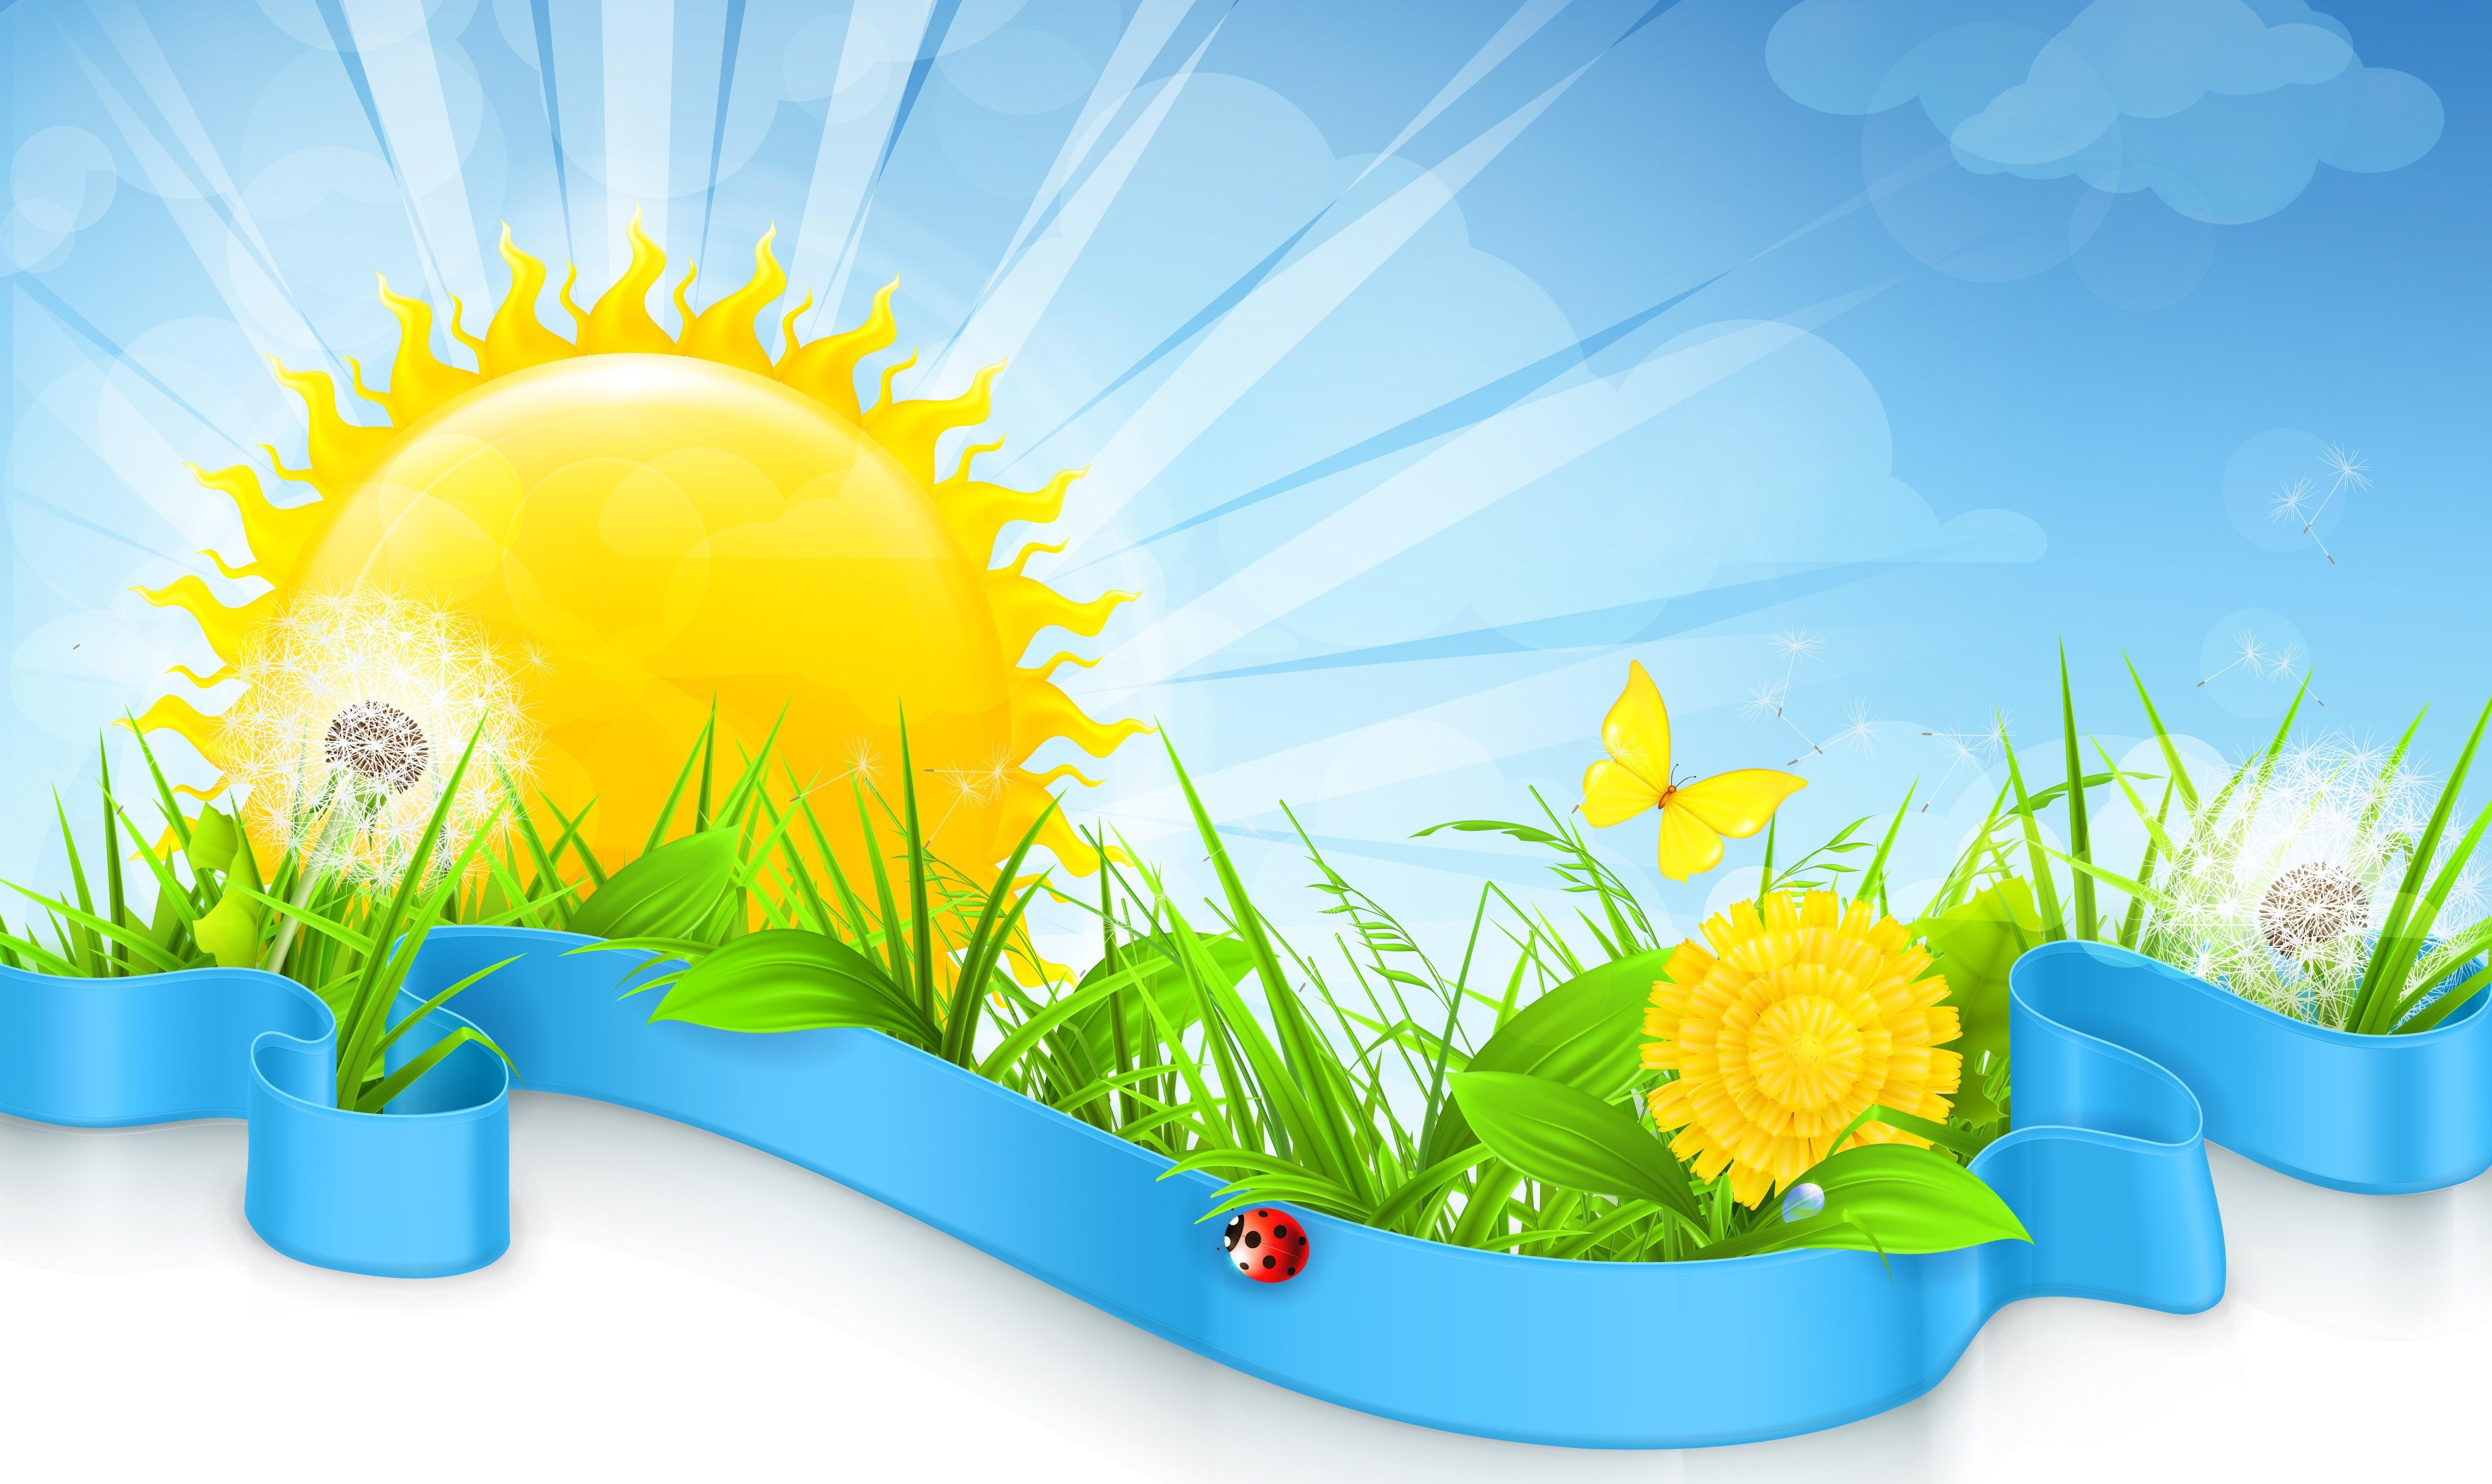 1348918292-5515960-veckor_flowers_6-1